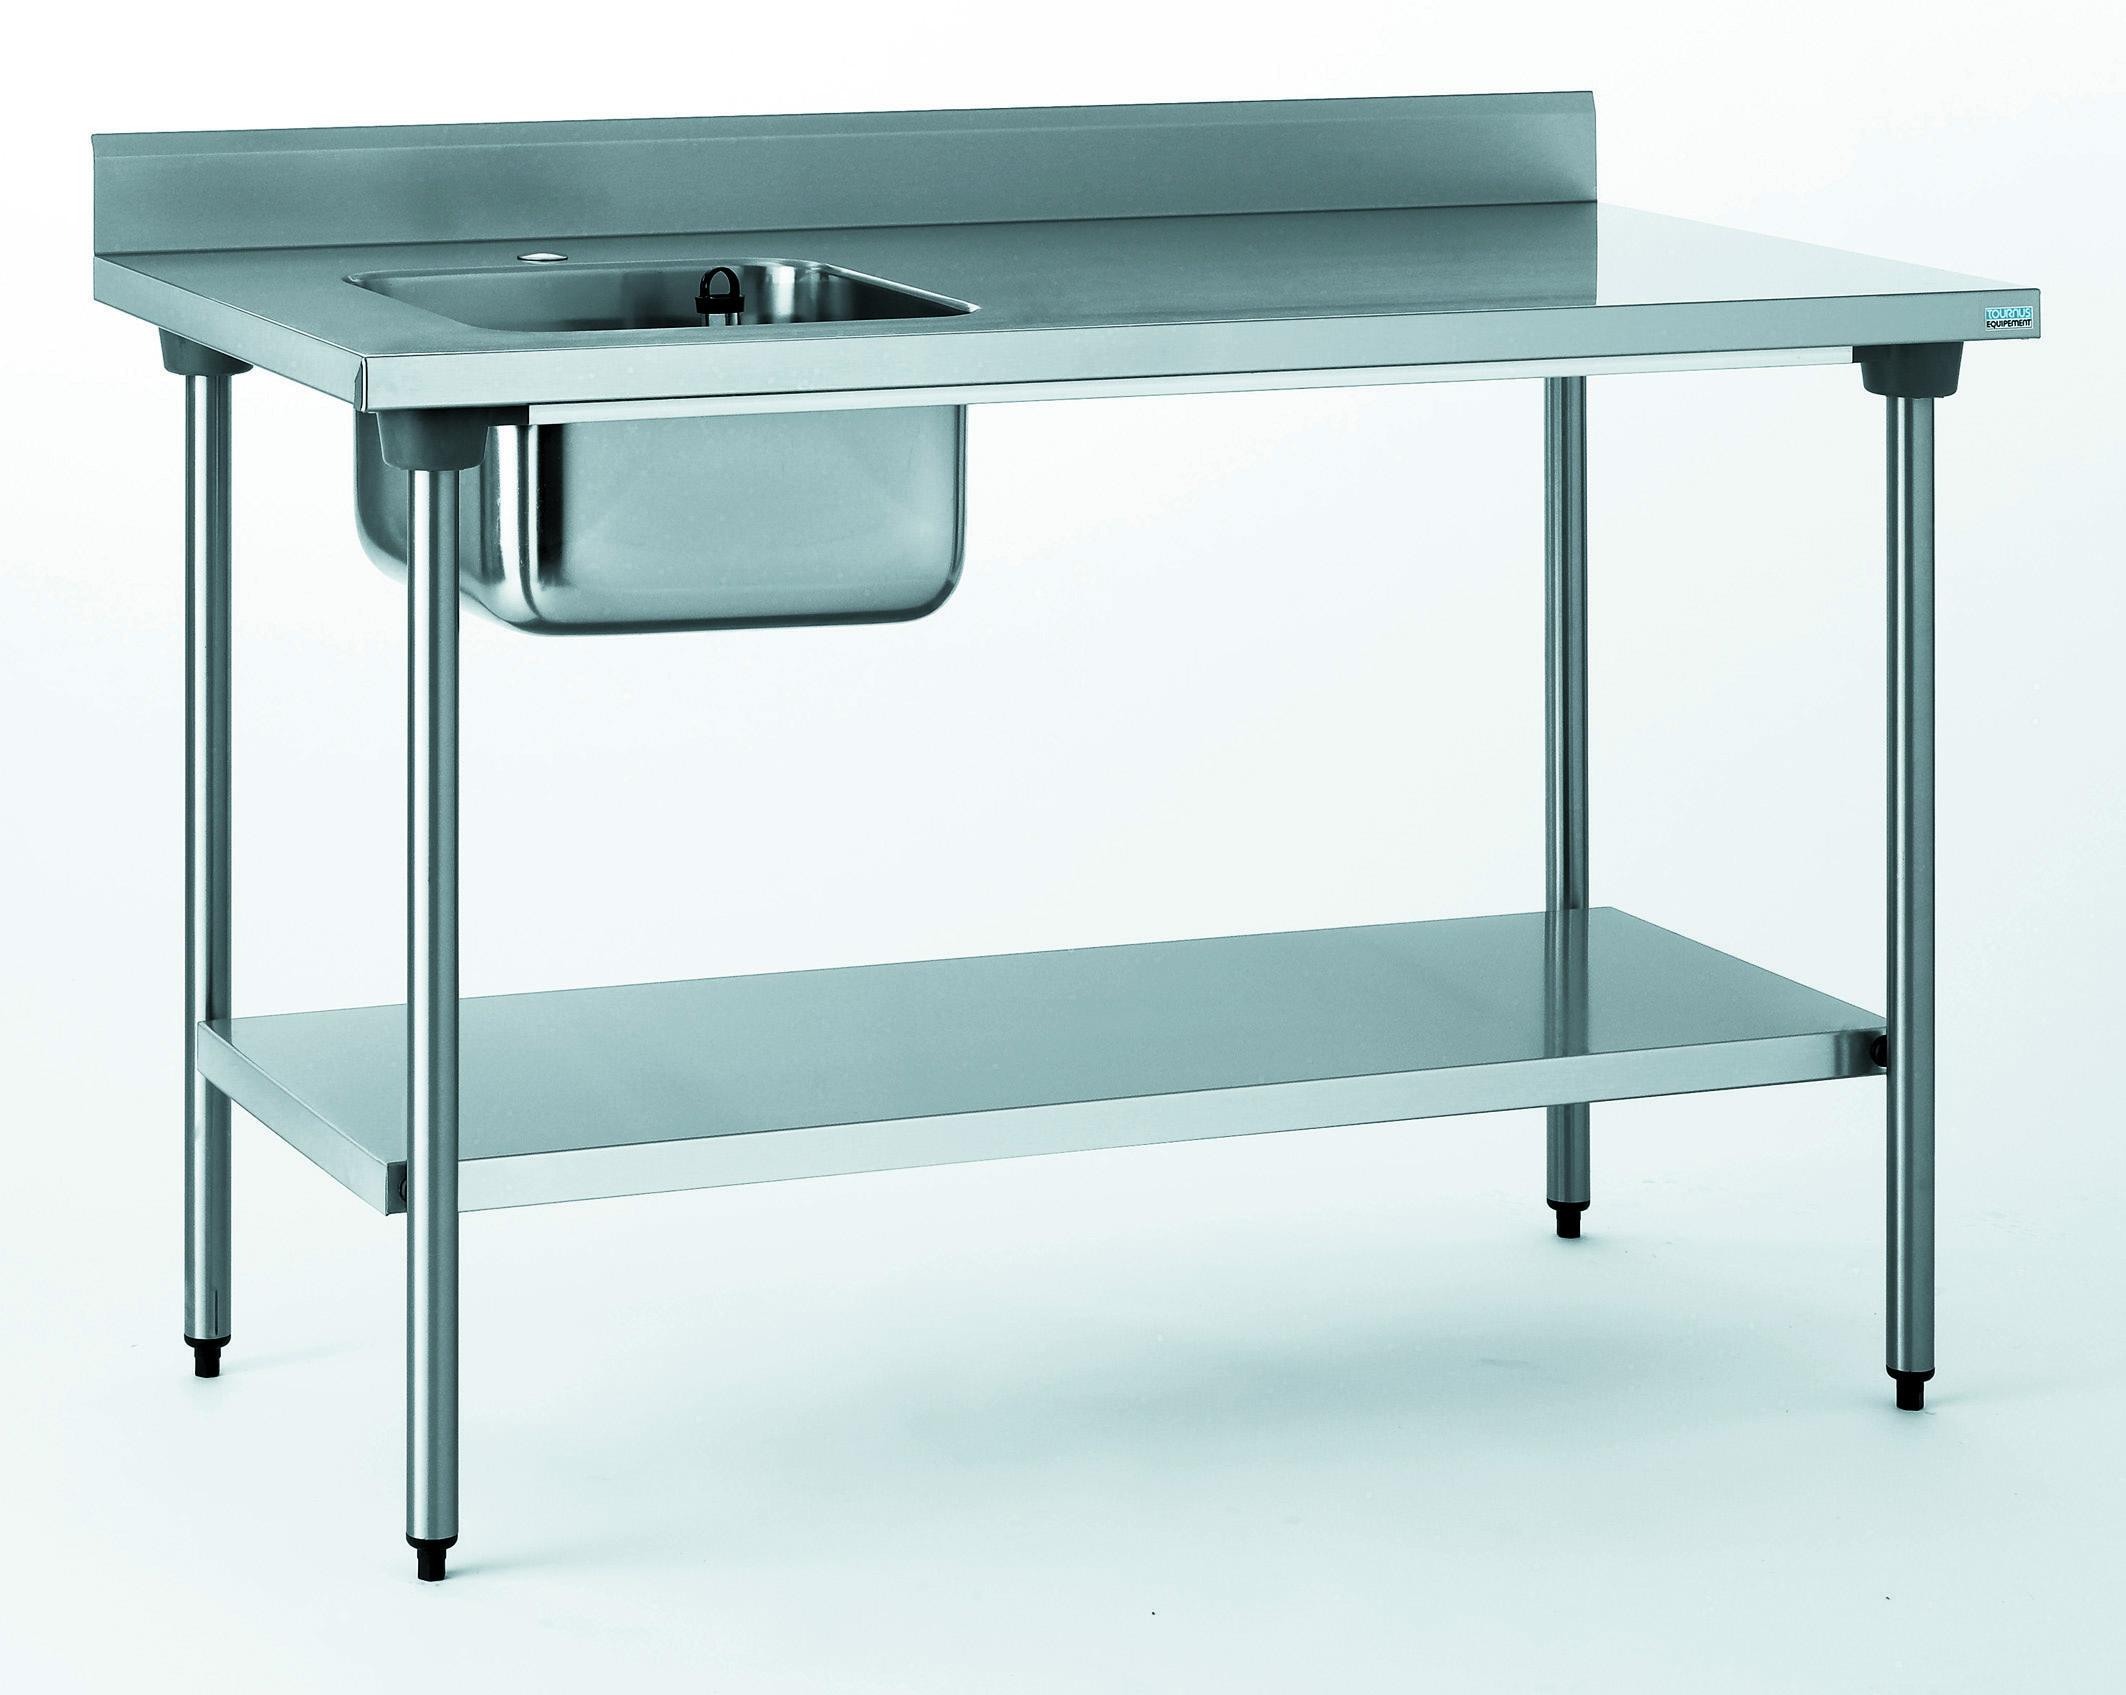 TABLE DU CHEF CHR 700X1600 BAC A GAUCHE+ETAGERE- SANS ROBINE